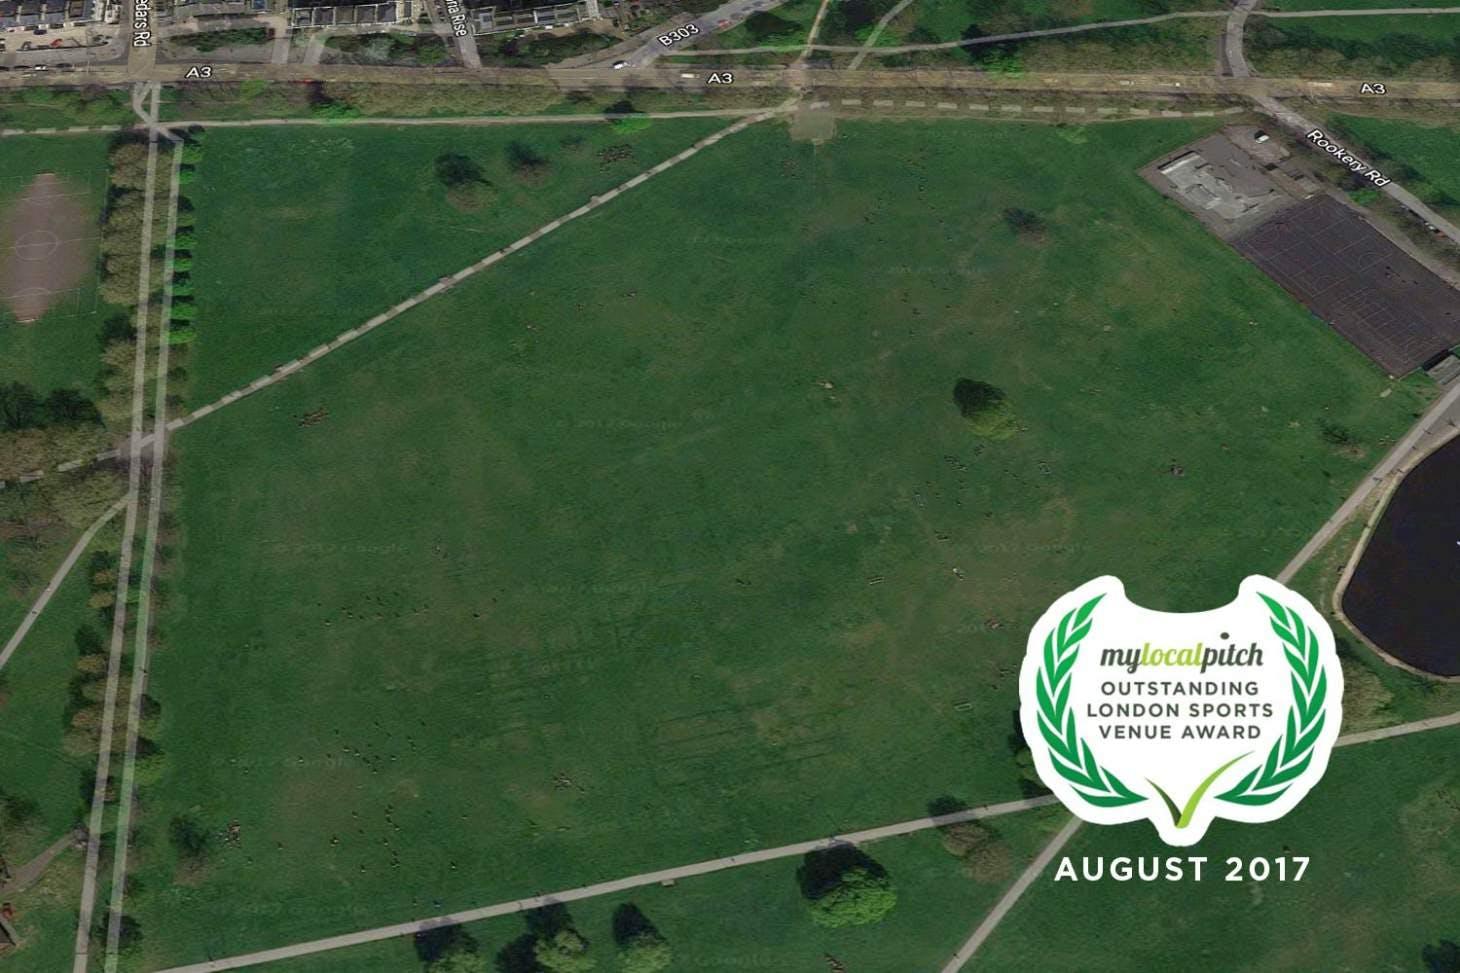 Clapham Common Full size | Grass cricket facilities